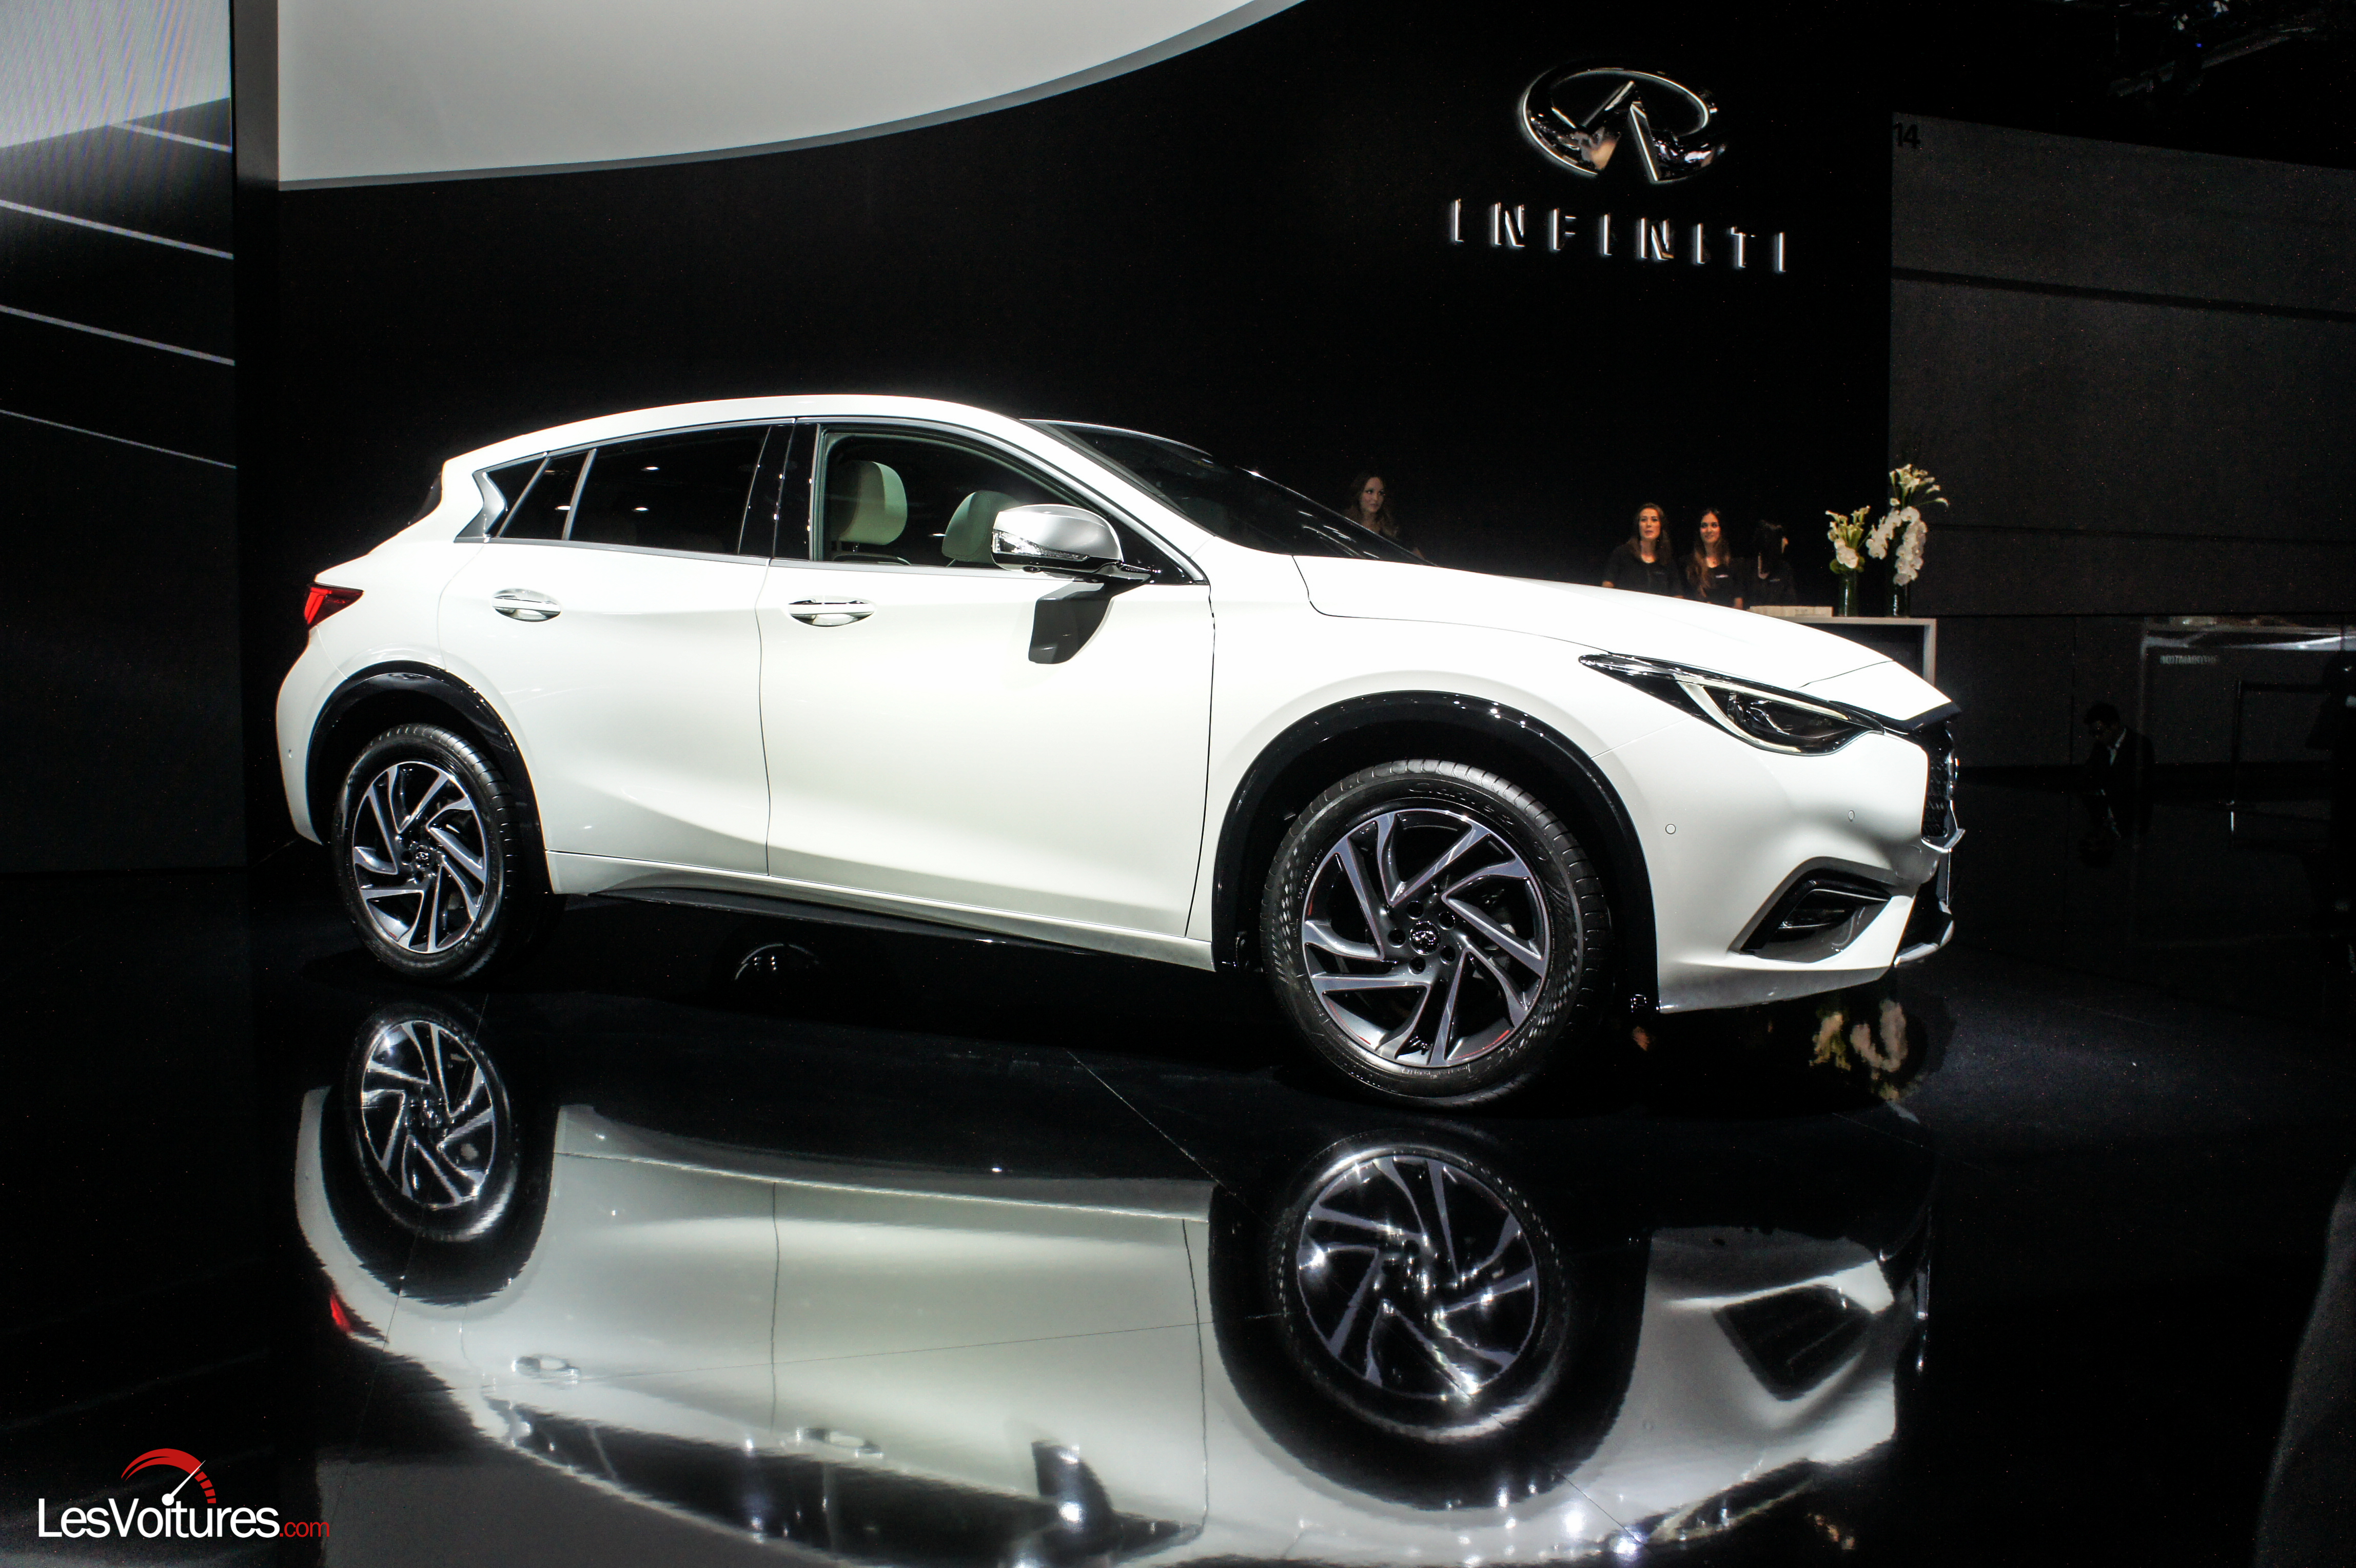 salon francfort 2015 automobile 62 infiniti q30 les voitures. Black Bedroom Furniture Sets. Home Design Ideas